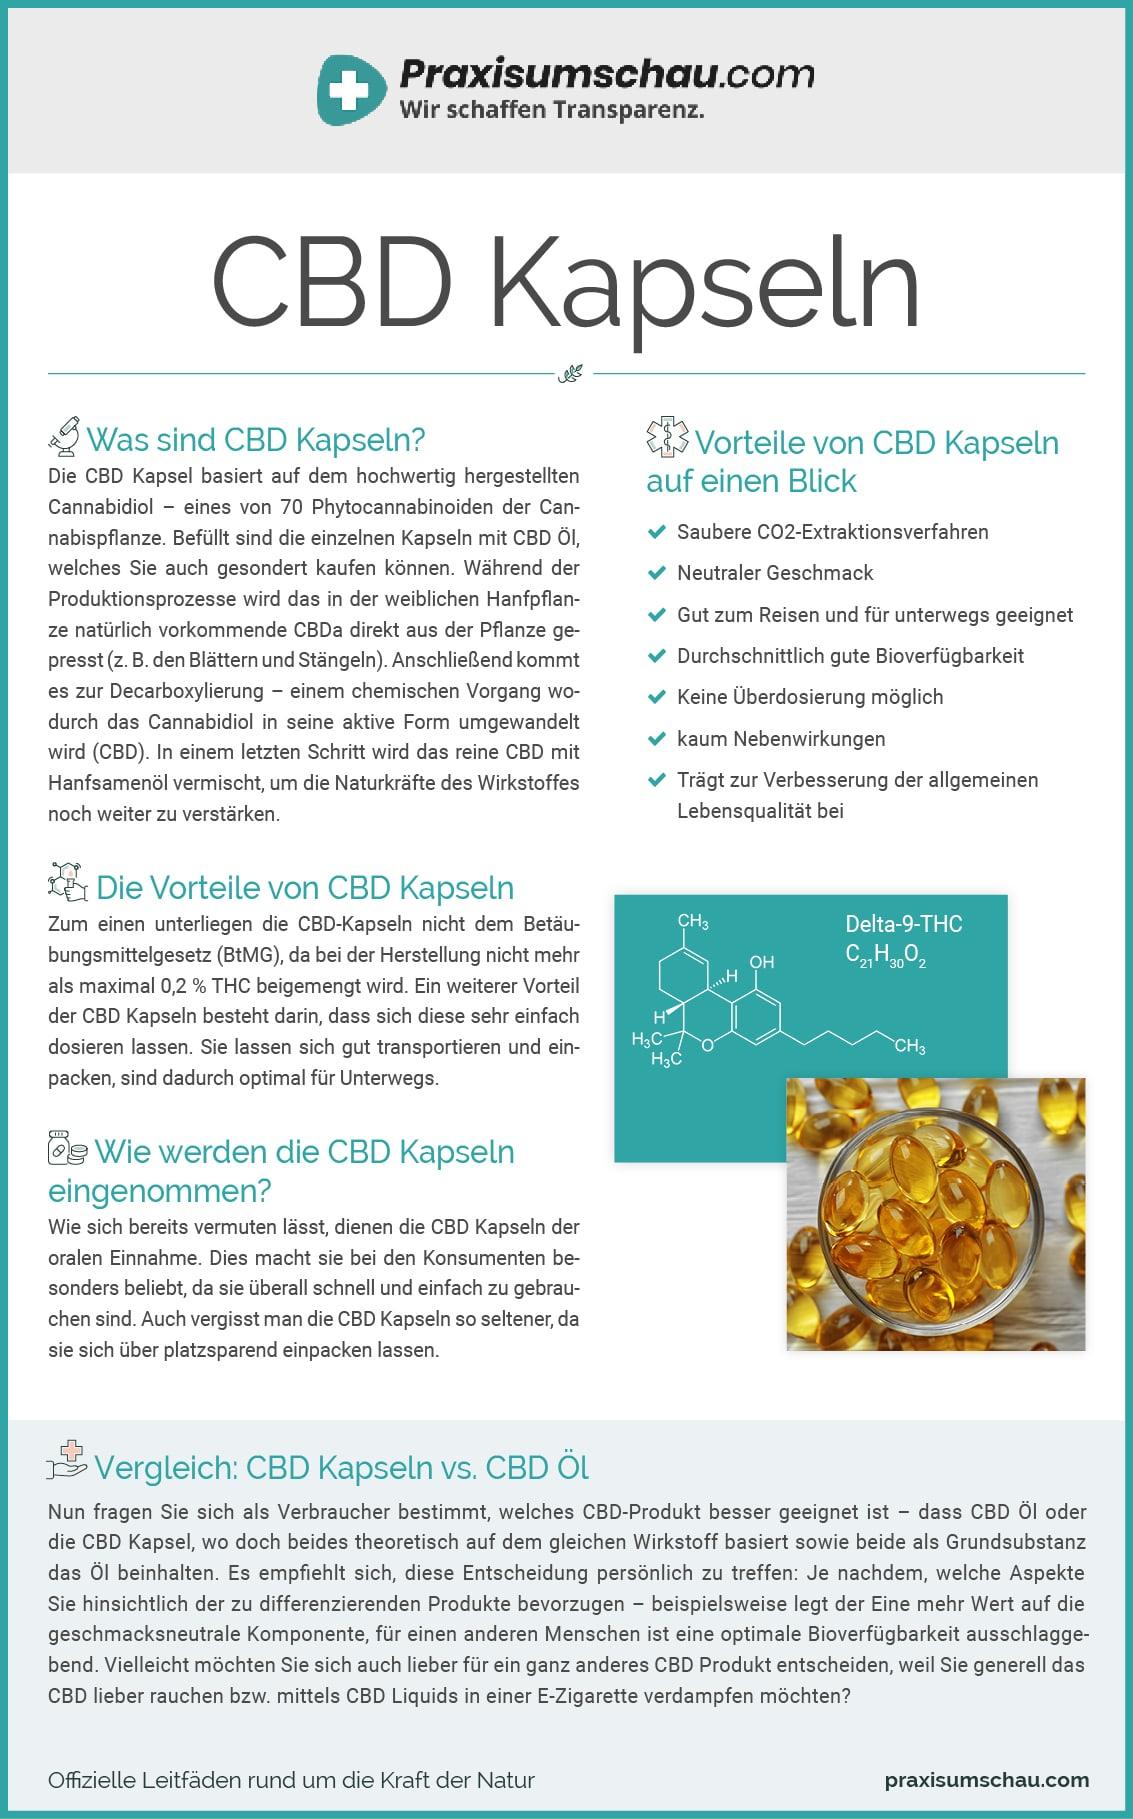 CBD kapseln infografik praxisumschau